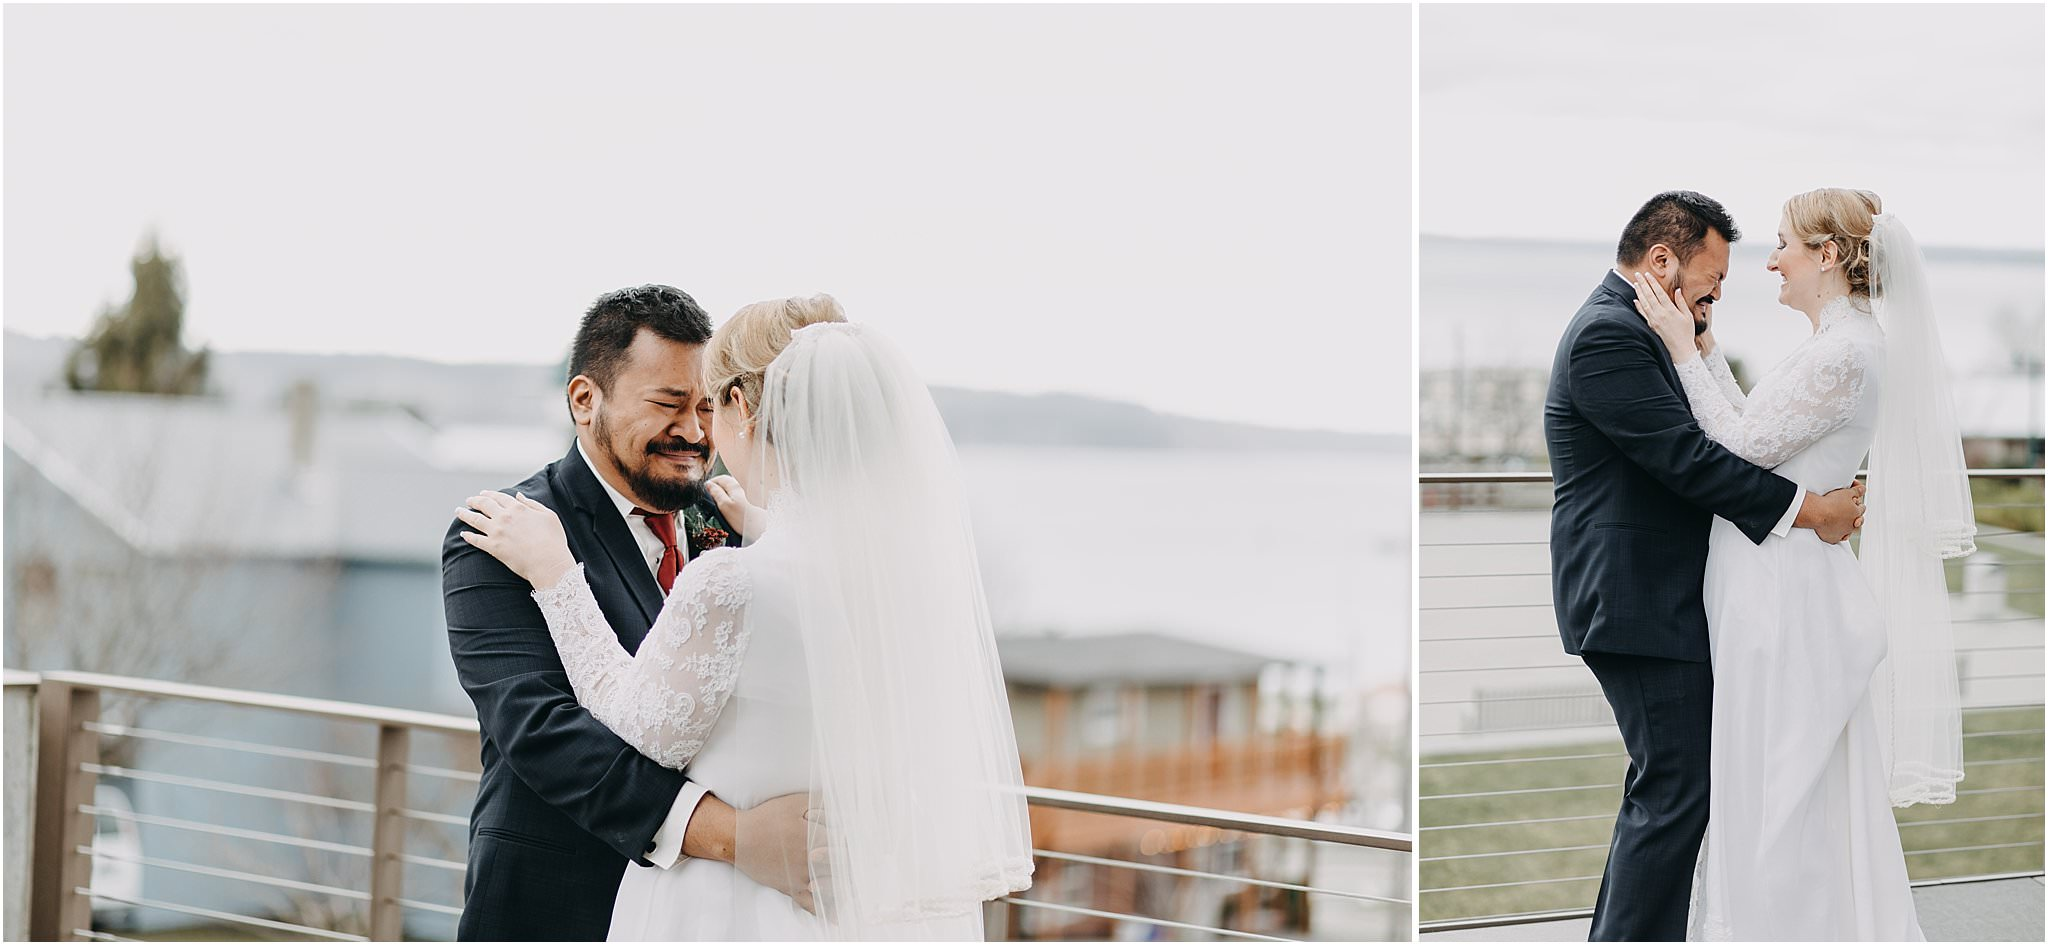 katy-robin-married-in-mukilteo-wedding17.jpg